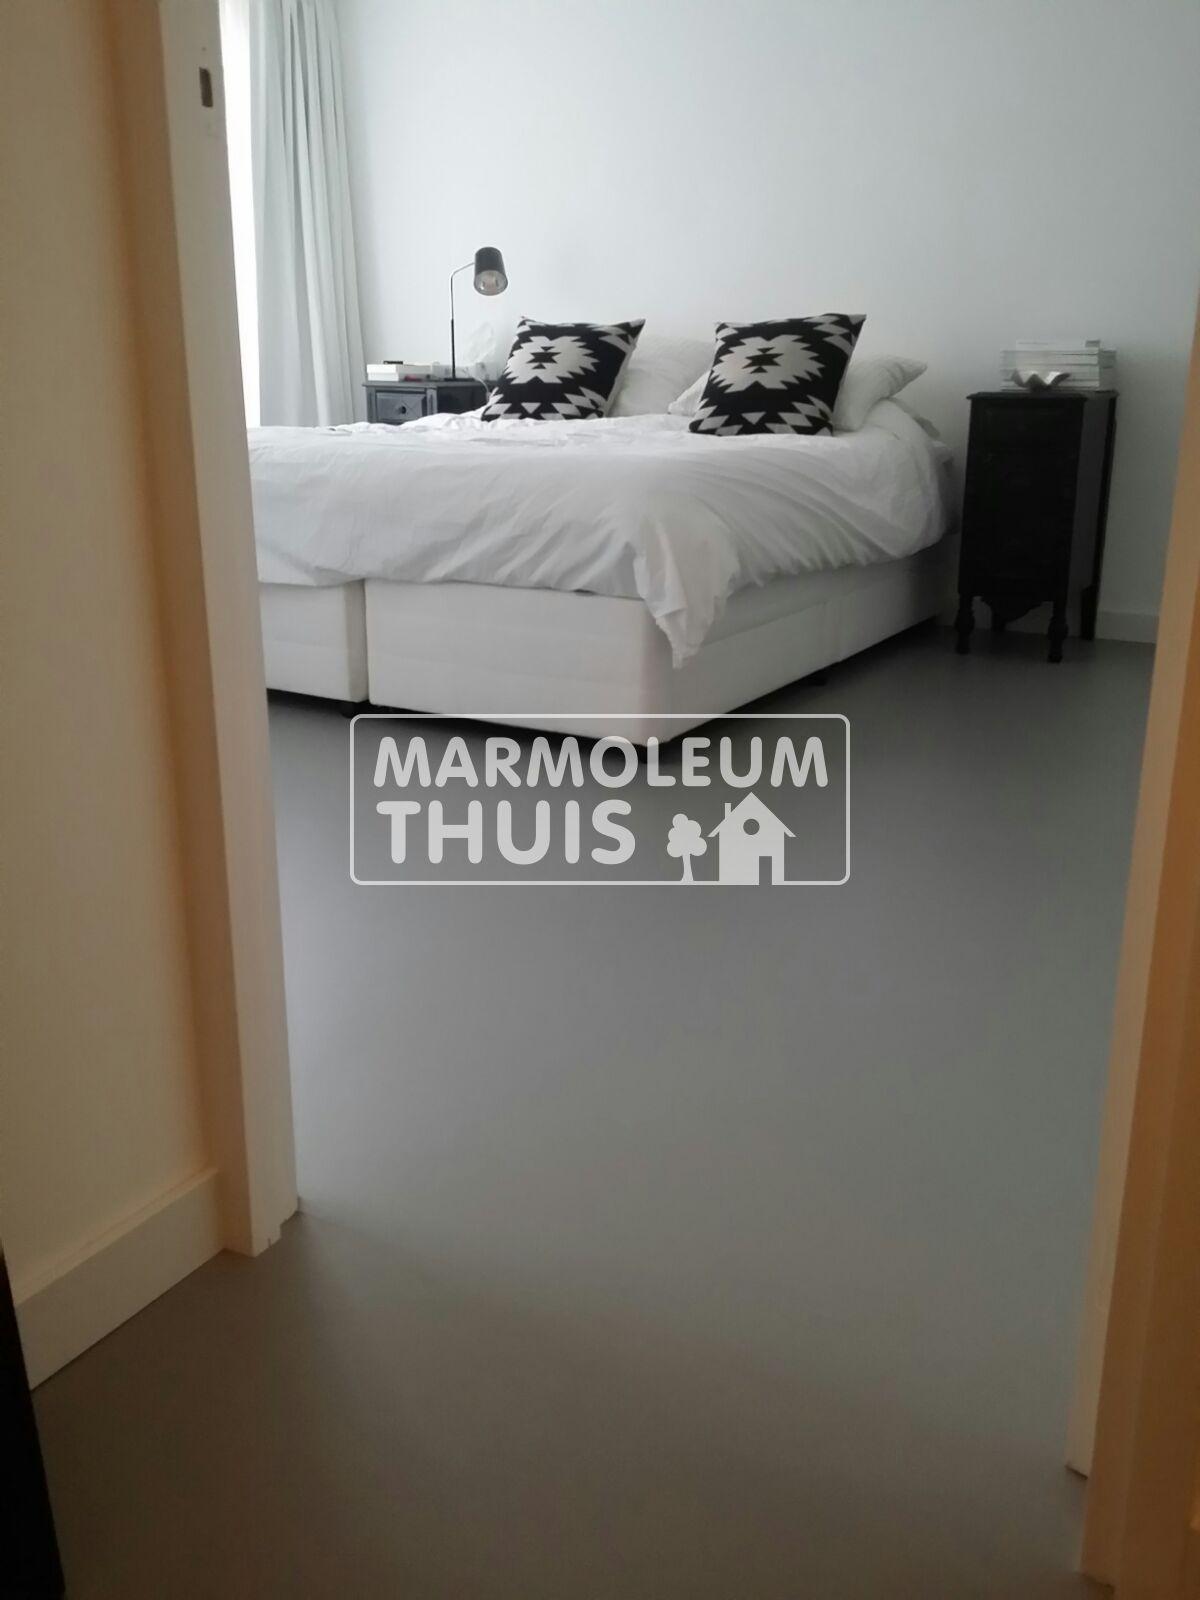 Best Marmoleum Slaapkamer Ideas - Moderne huis - clientstat.us